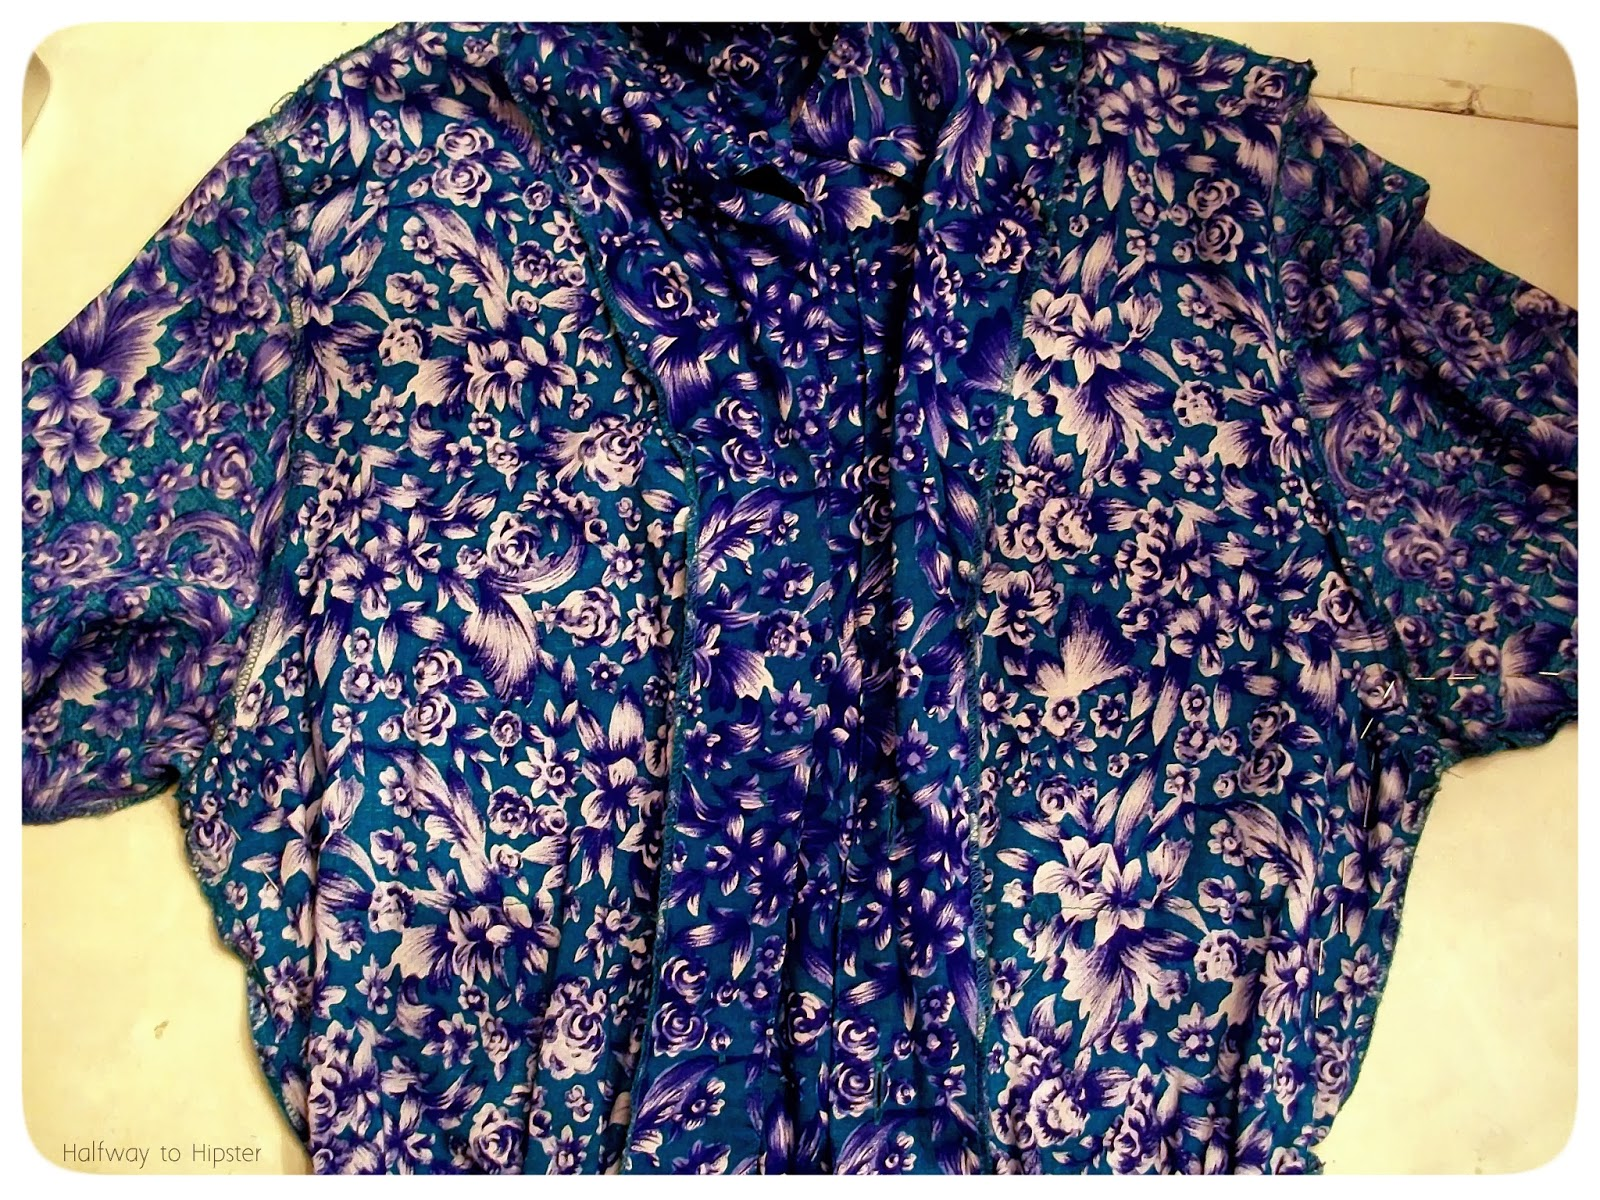 Teal Flowered Dress Refashion